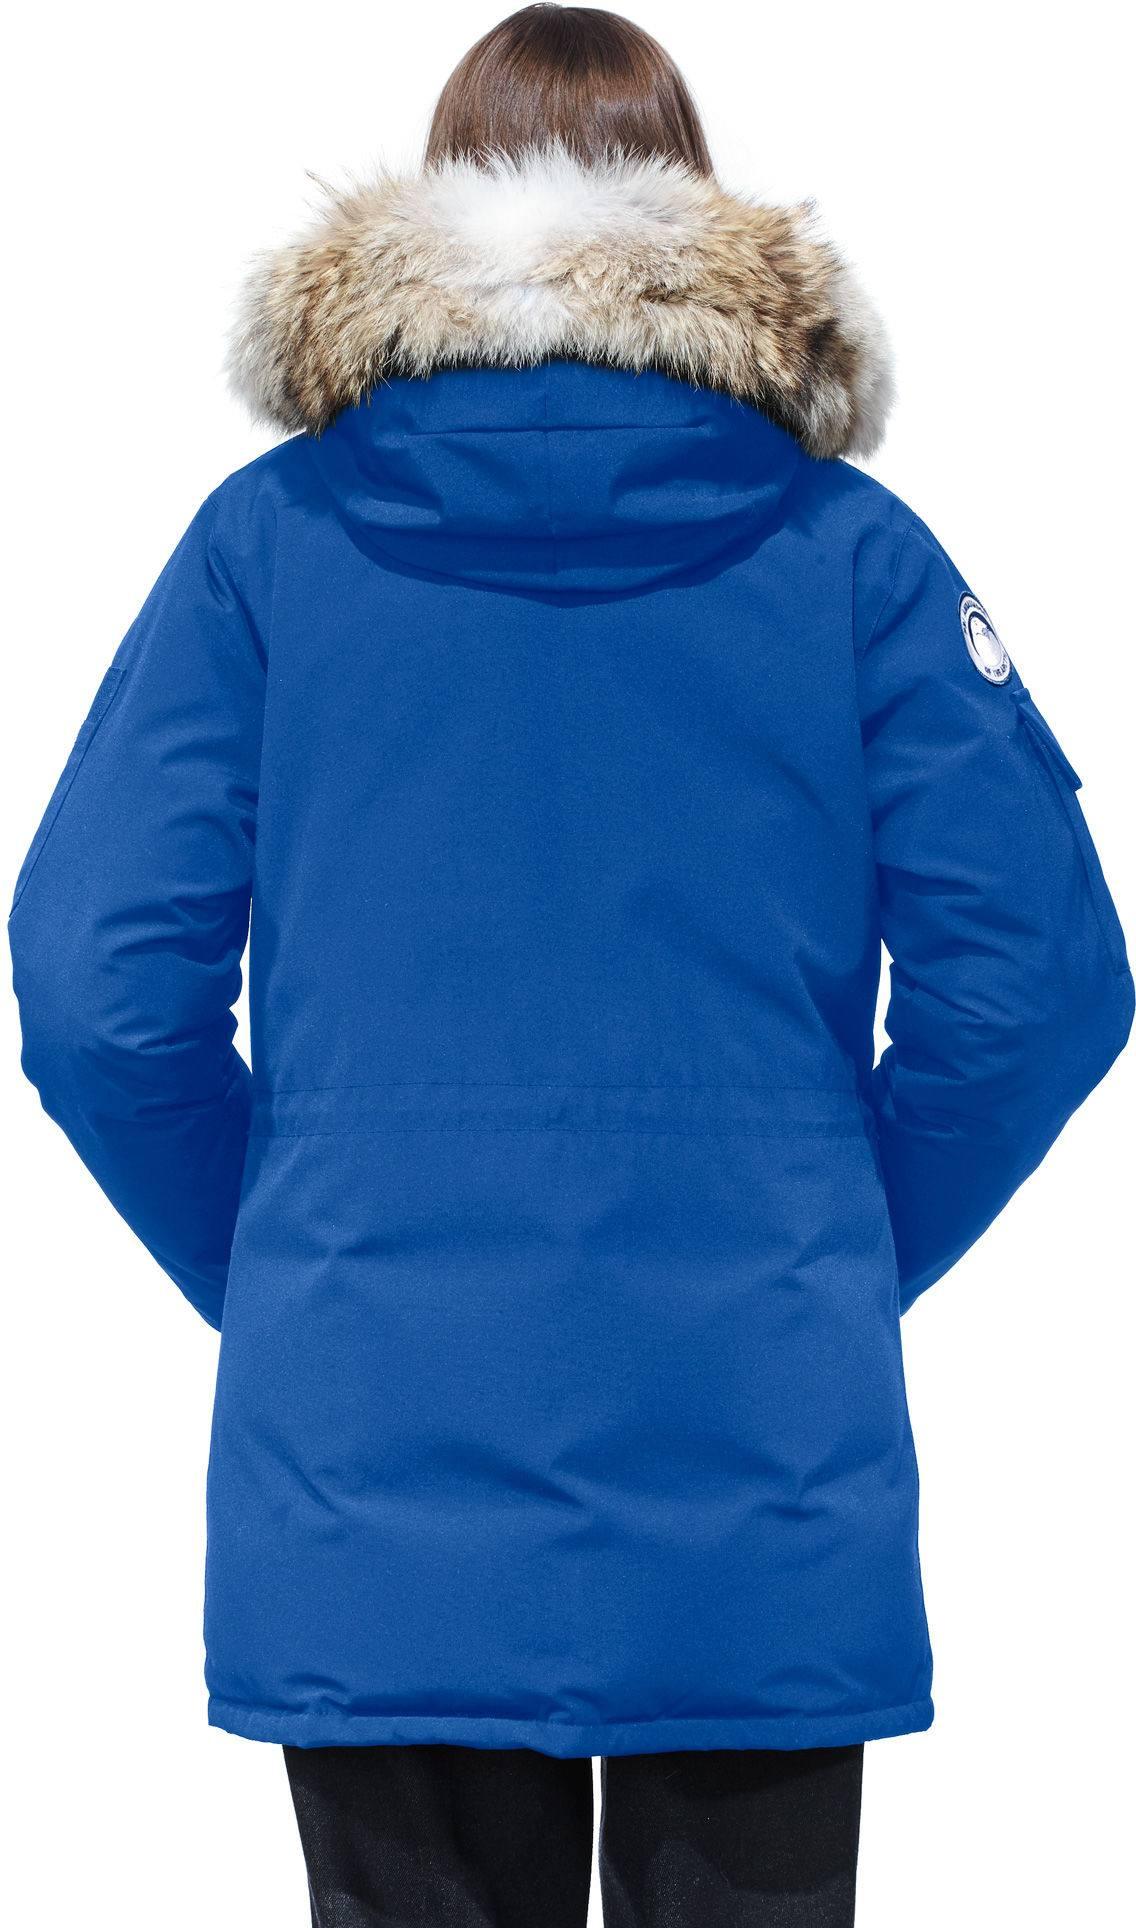 461e71689dcc Canada Goose PBI Expedition Parka Women s